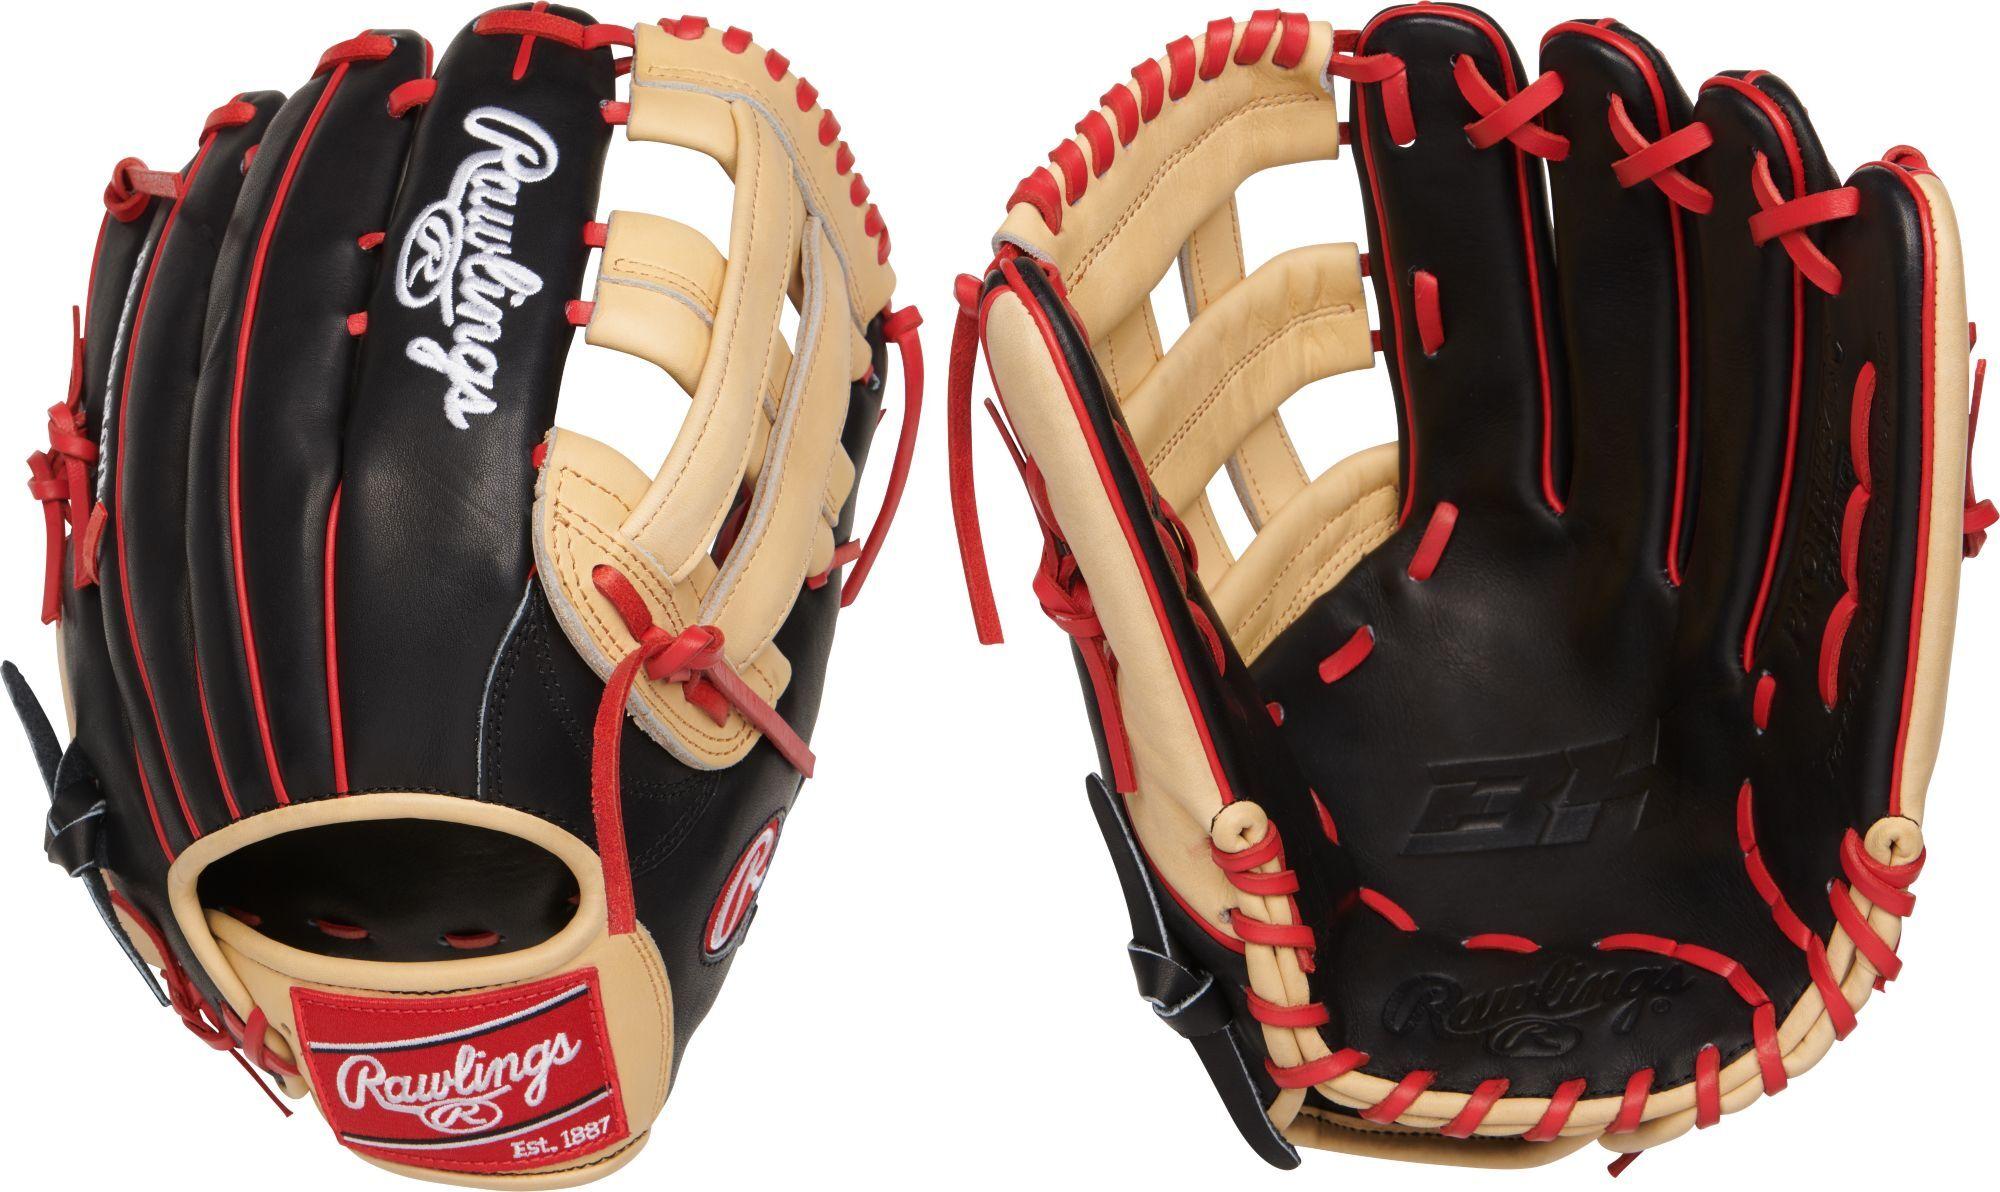 Rawlings 12.75'' Bryce Harper HOH R2G Series Glove, Black